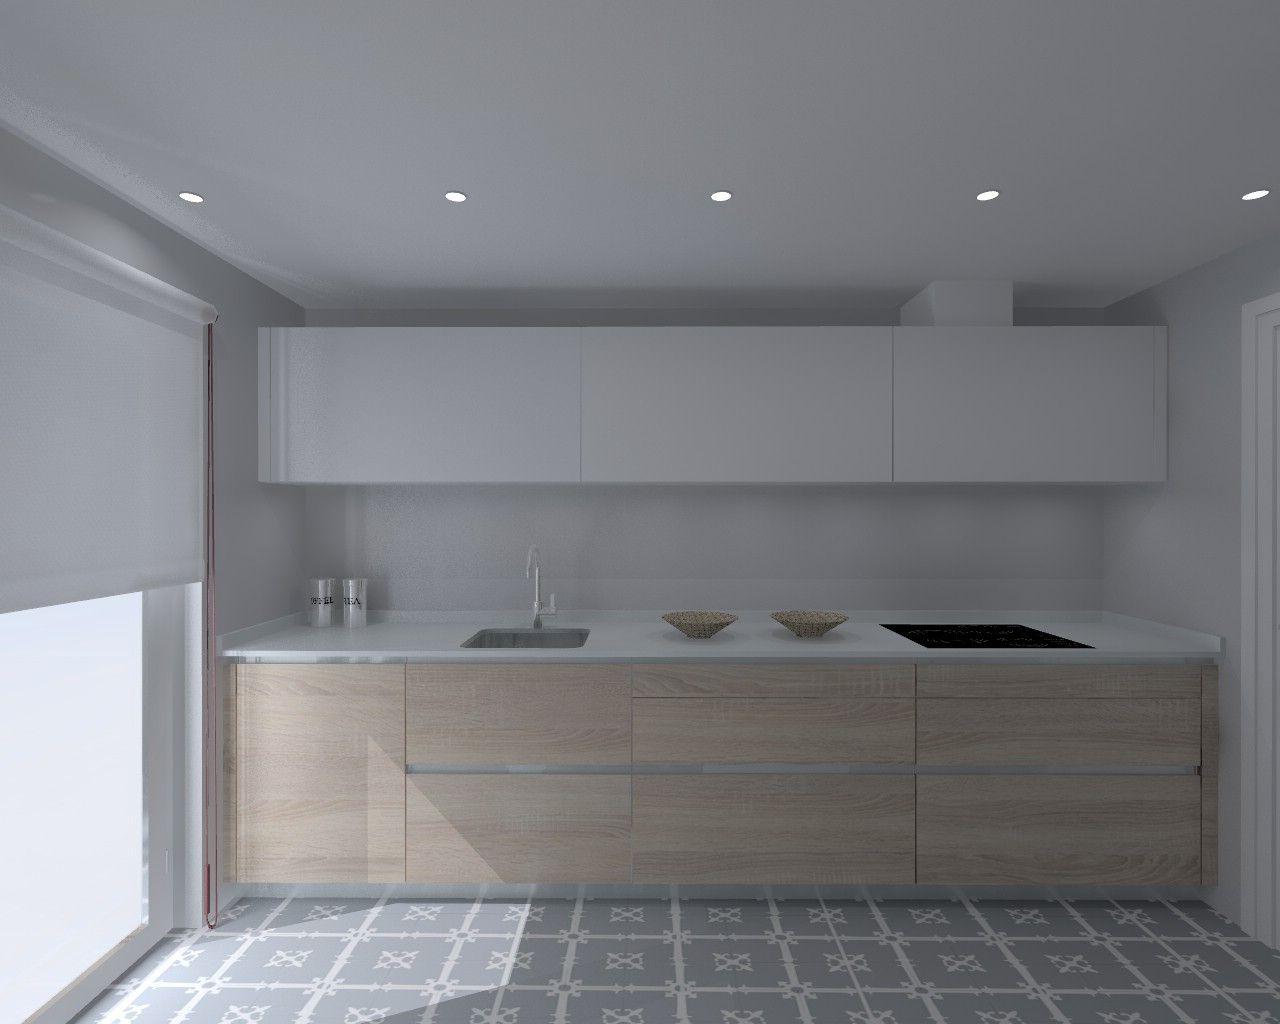 Proyectos cocinas modernas muebles de cocina con isla for Proyecto muebles de cocina